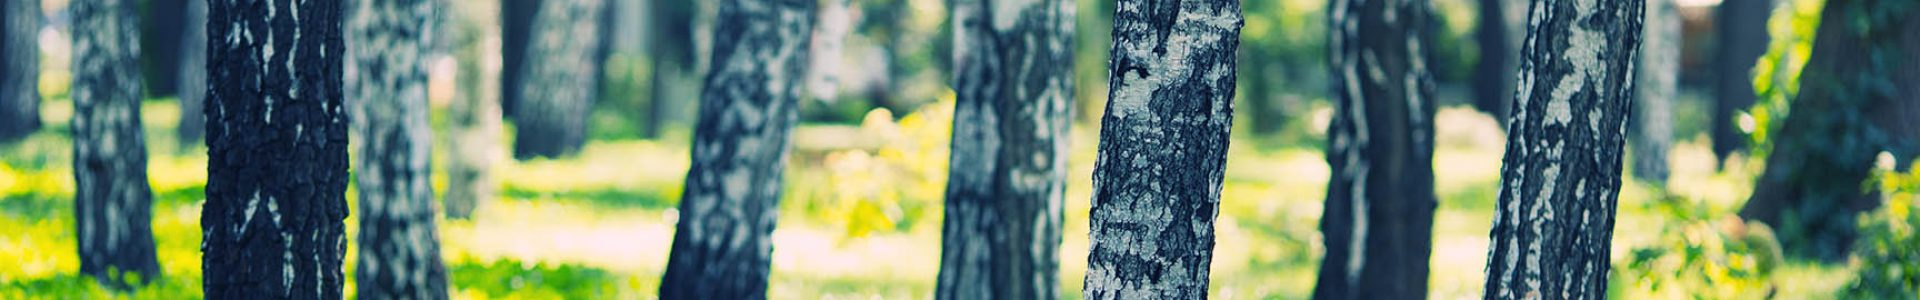 White birches forest at summer day